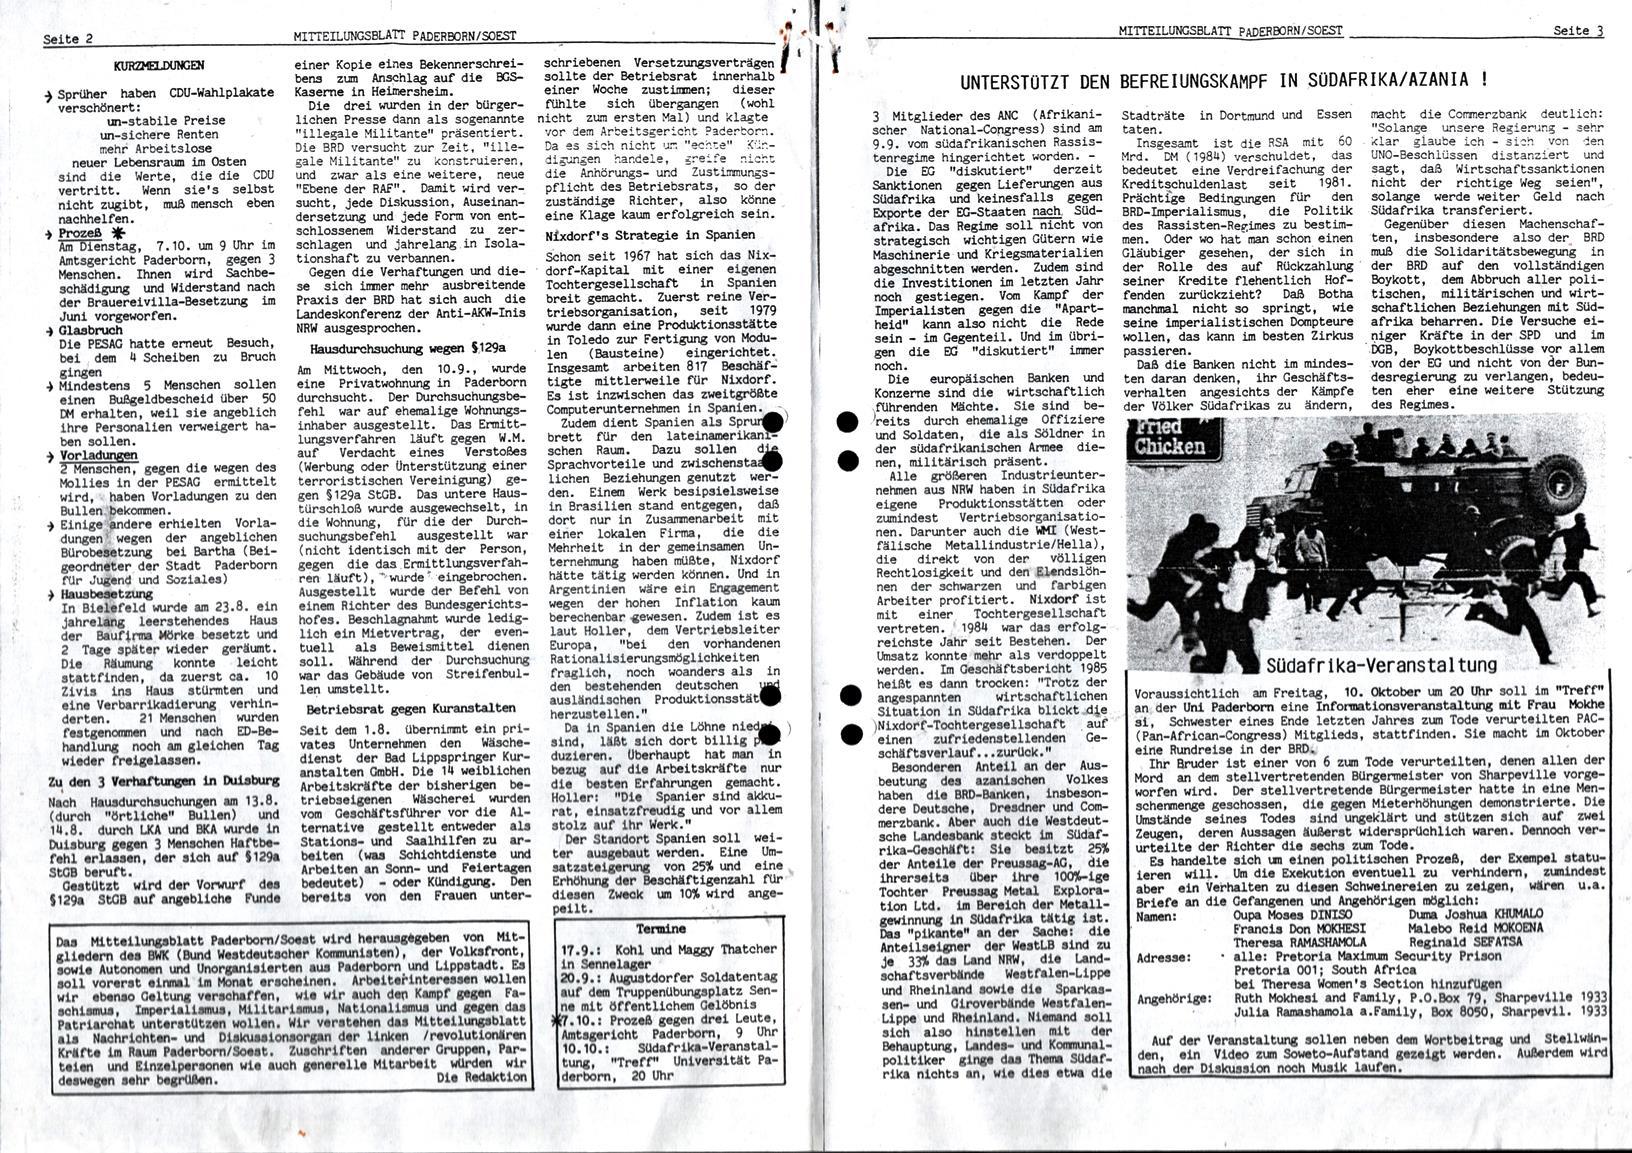 Paderborn_BWK_Mitteilungsblatt_19860915_002